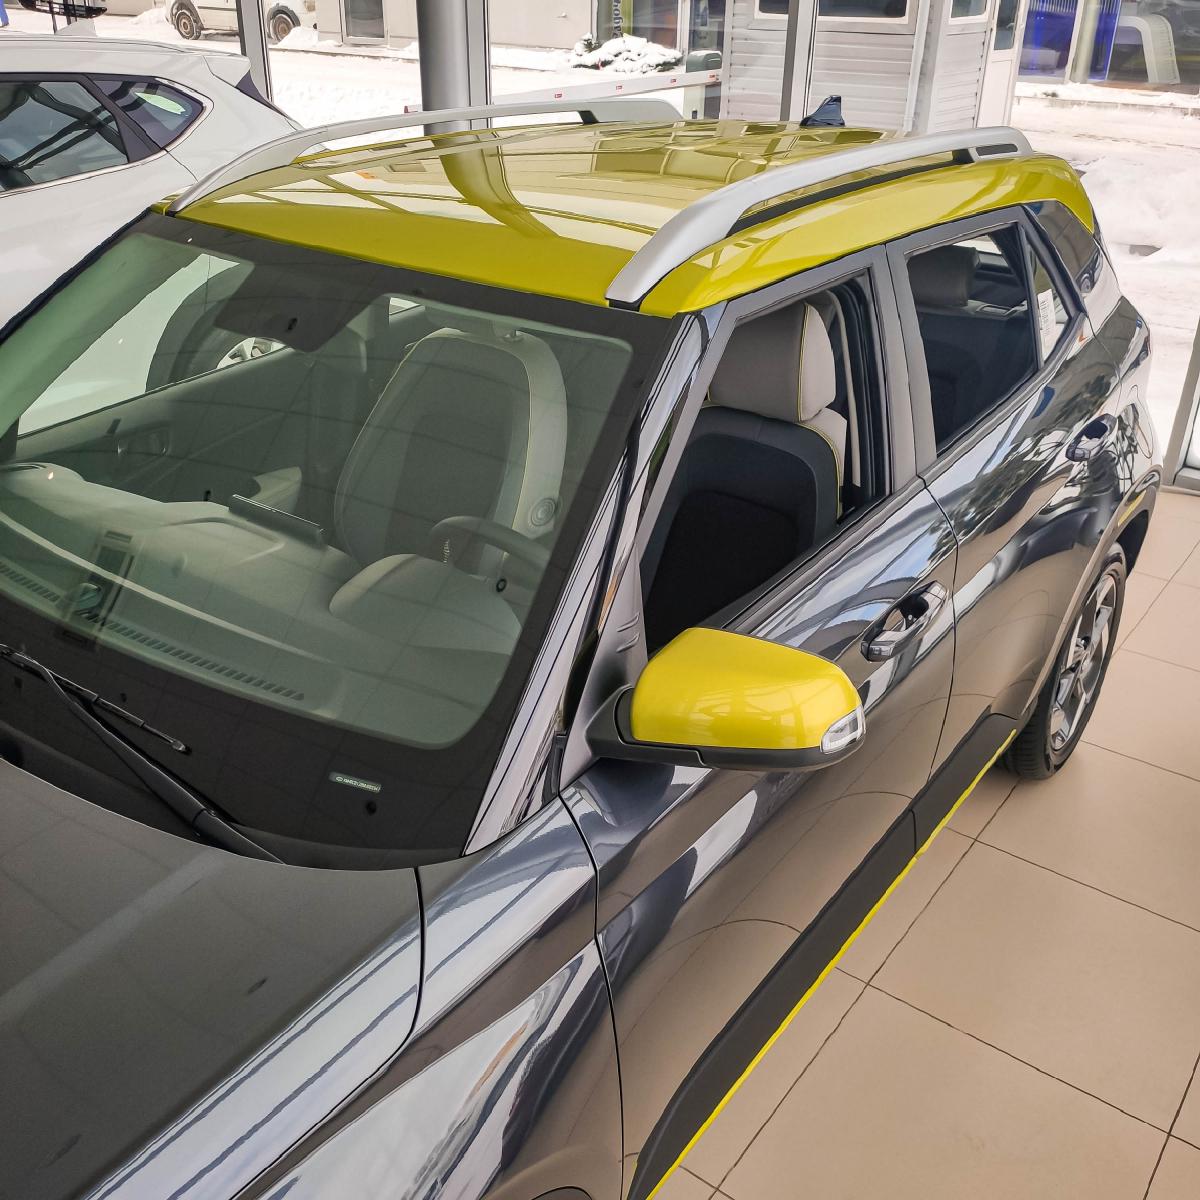 Абсолютно новий компактний міський кросовер Hyundai Venue   Хюндай Мотор Україна - фото 9